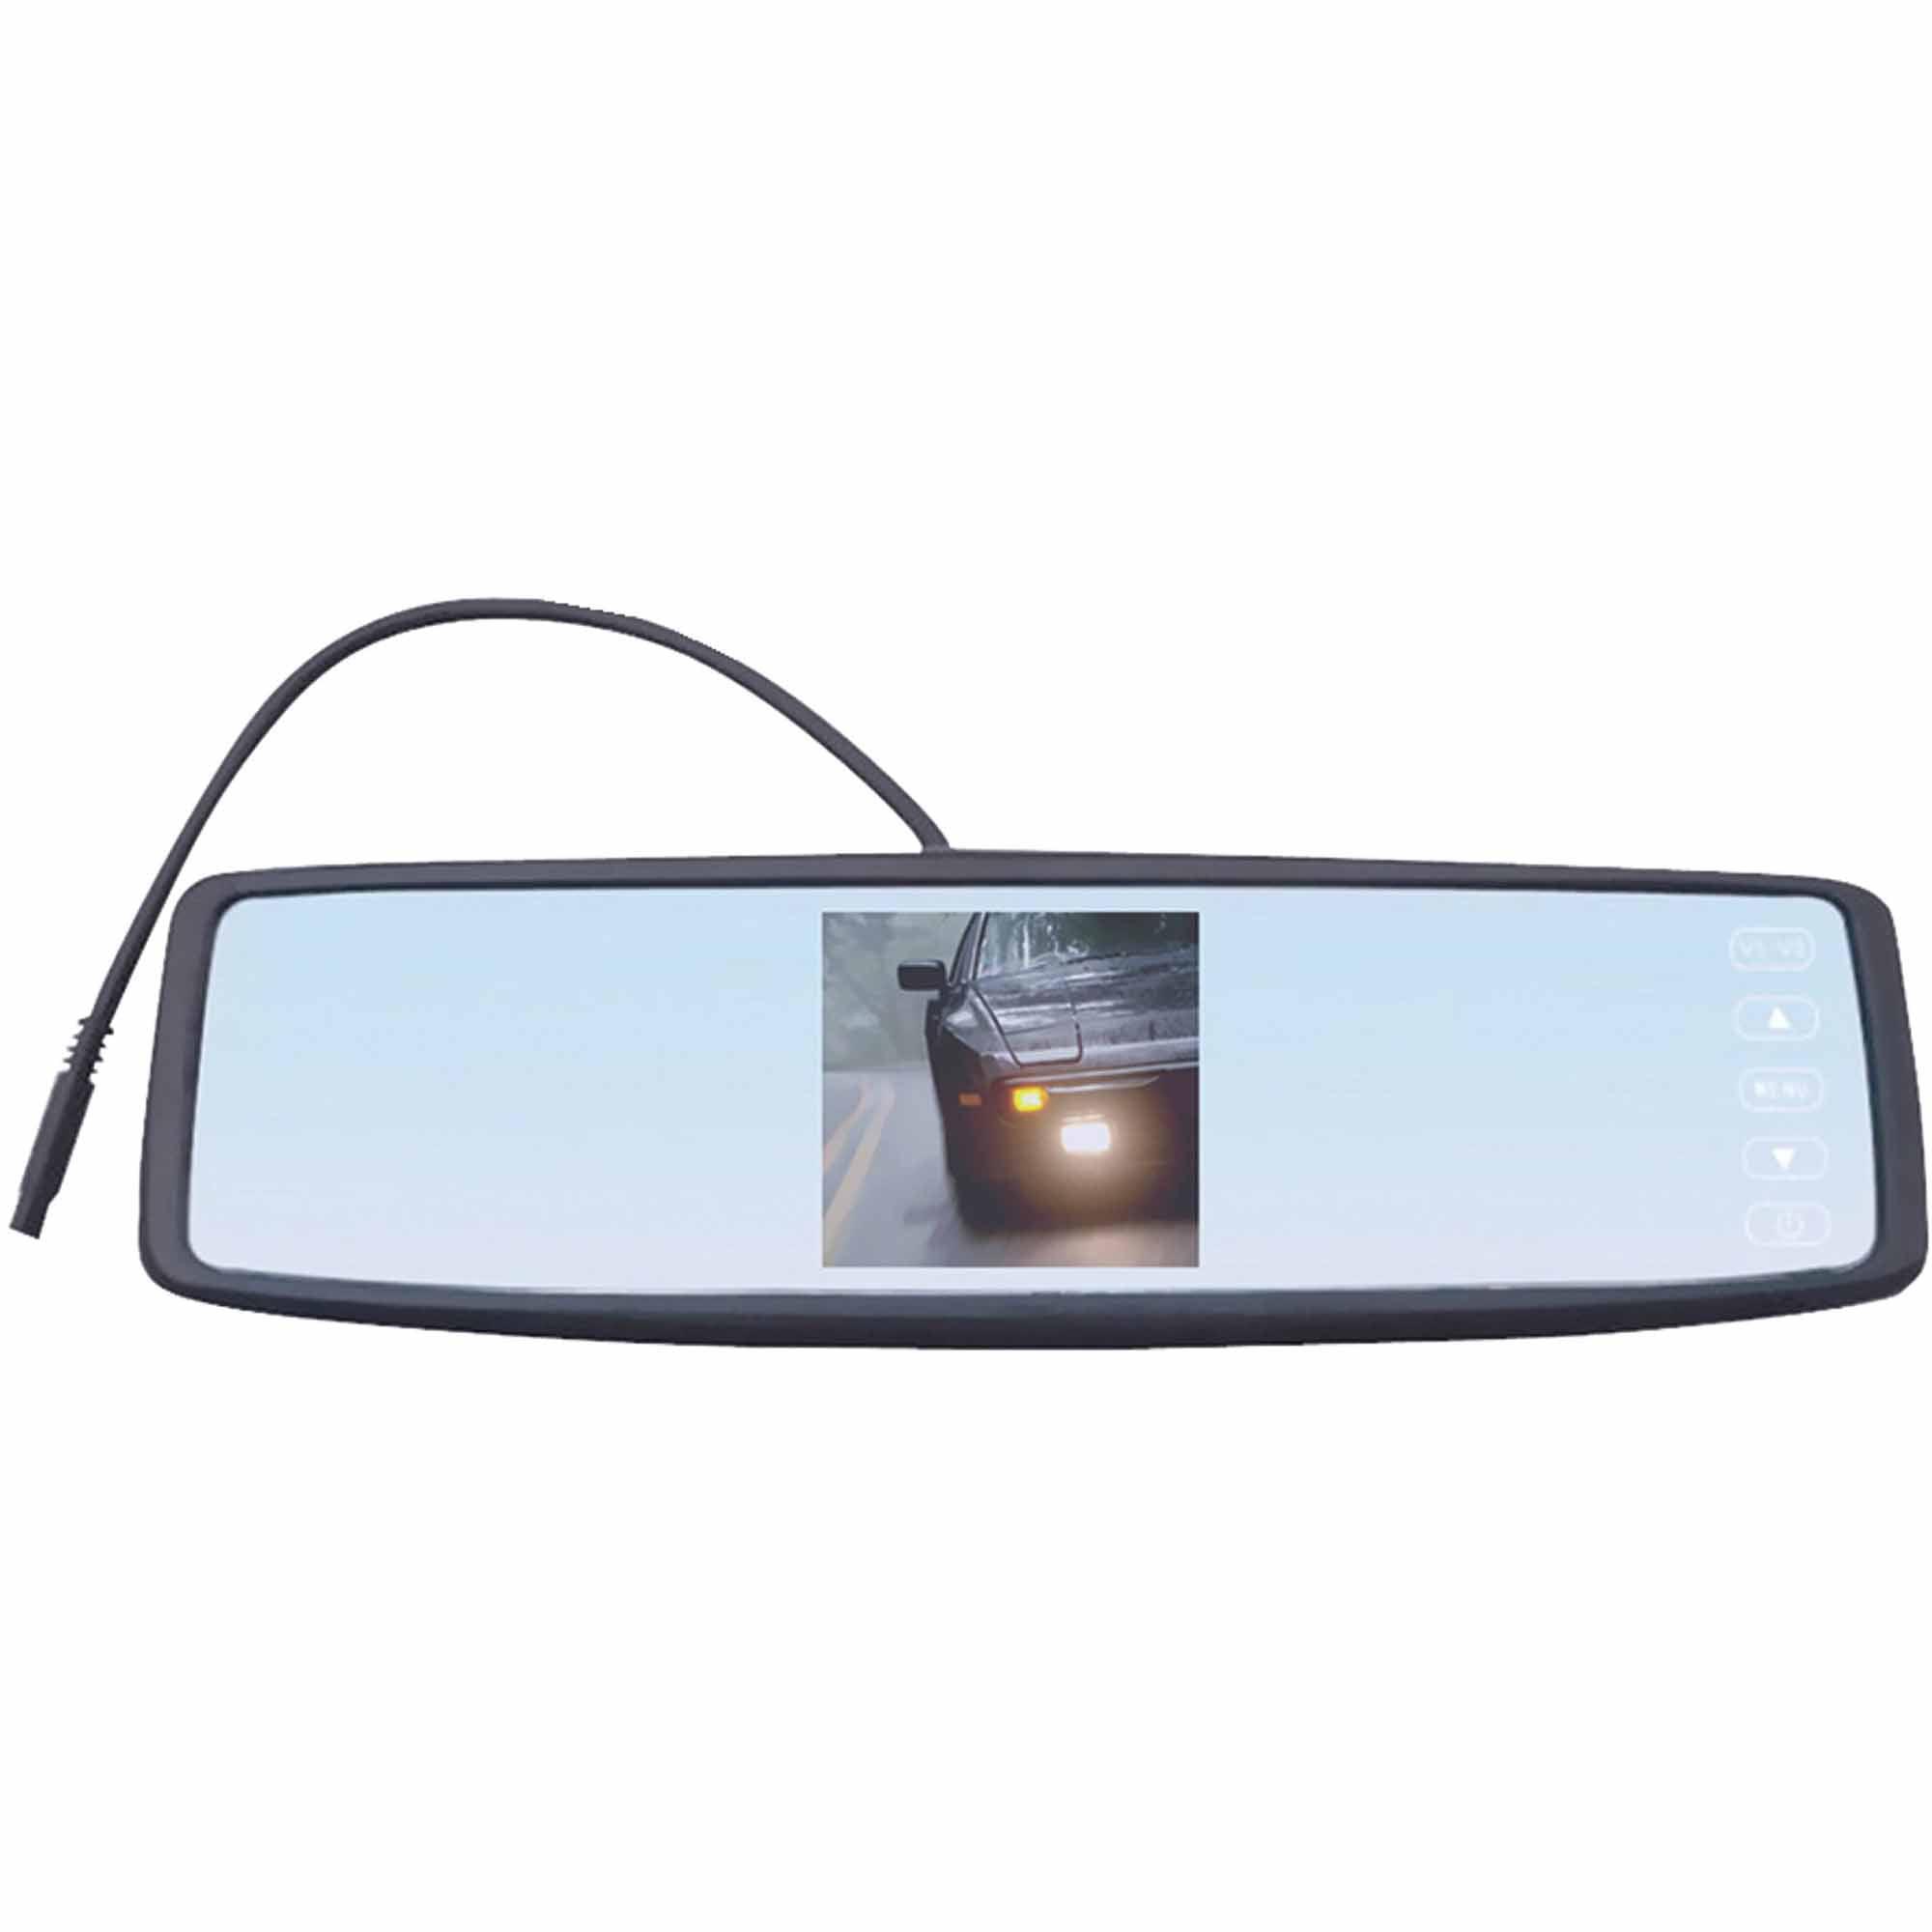 Sound Around Pyle PLCM4300WIR Wireless Rear View Mirror Backup Camera with Night Vision